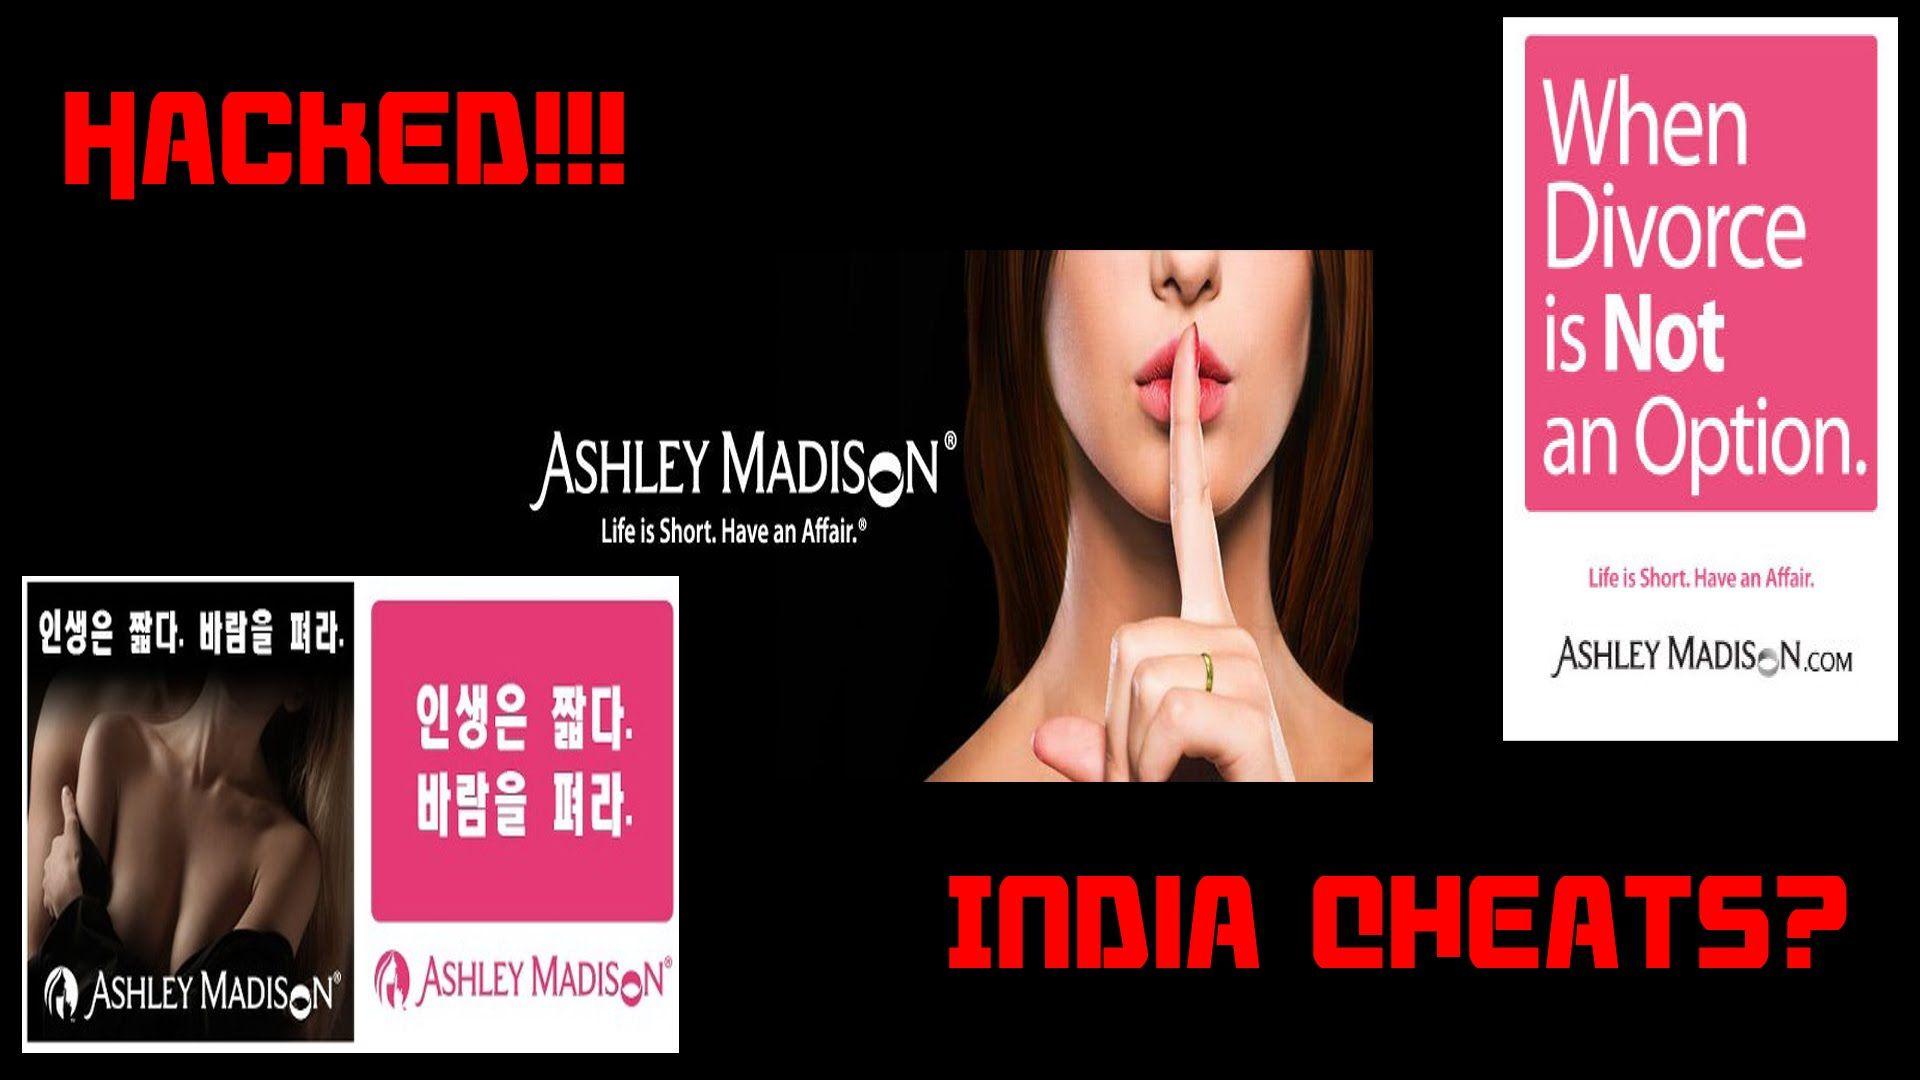 News - India Cheats? | Ashley Madison